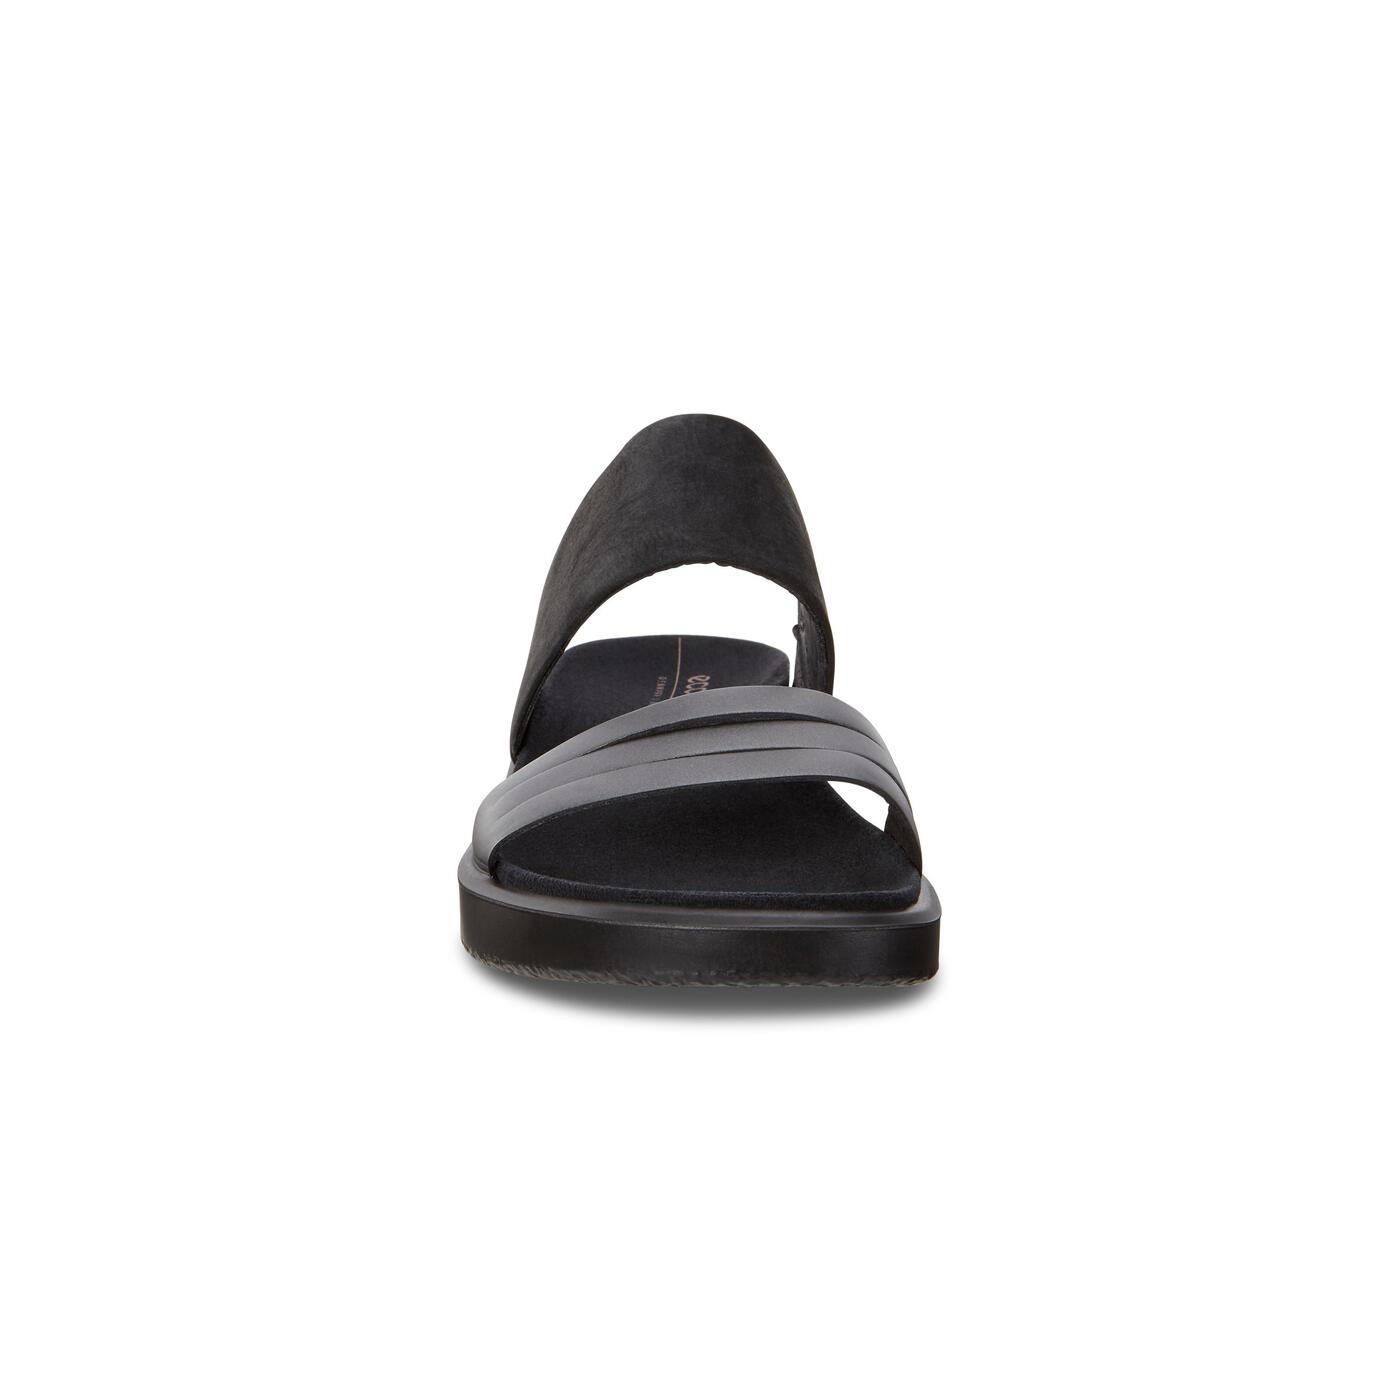 ECCO Flowt Women's Flat Slide Sandals